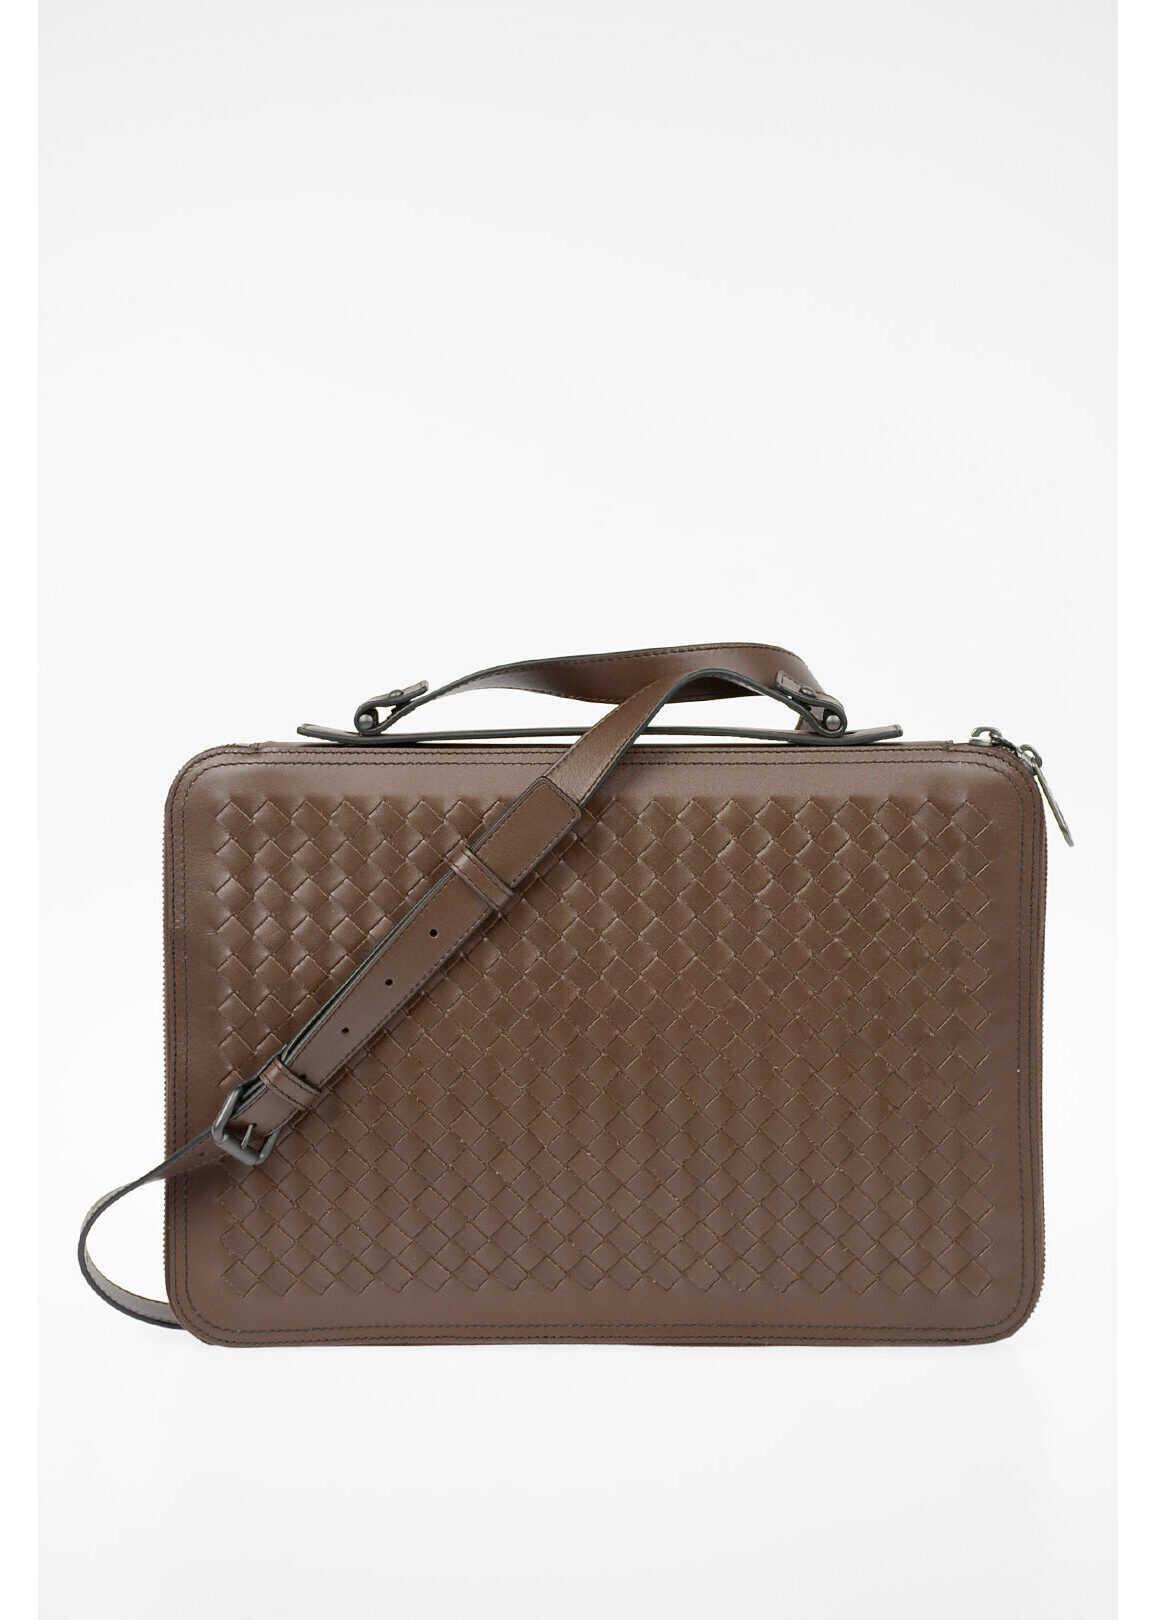 Bottega Veneta Braided Leather Briefcase BROWN imagine b-mall.ro